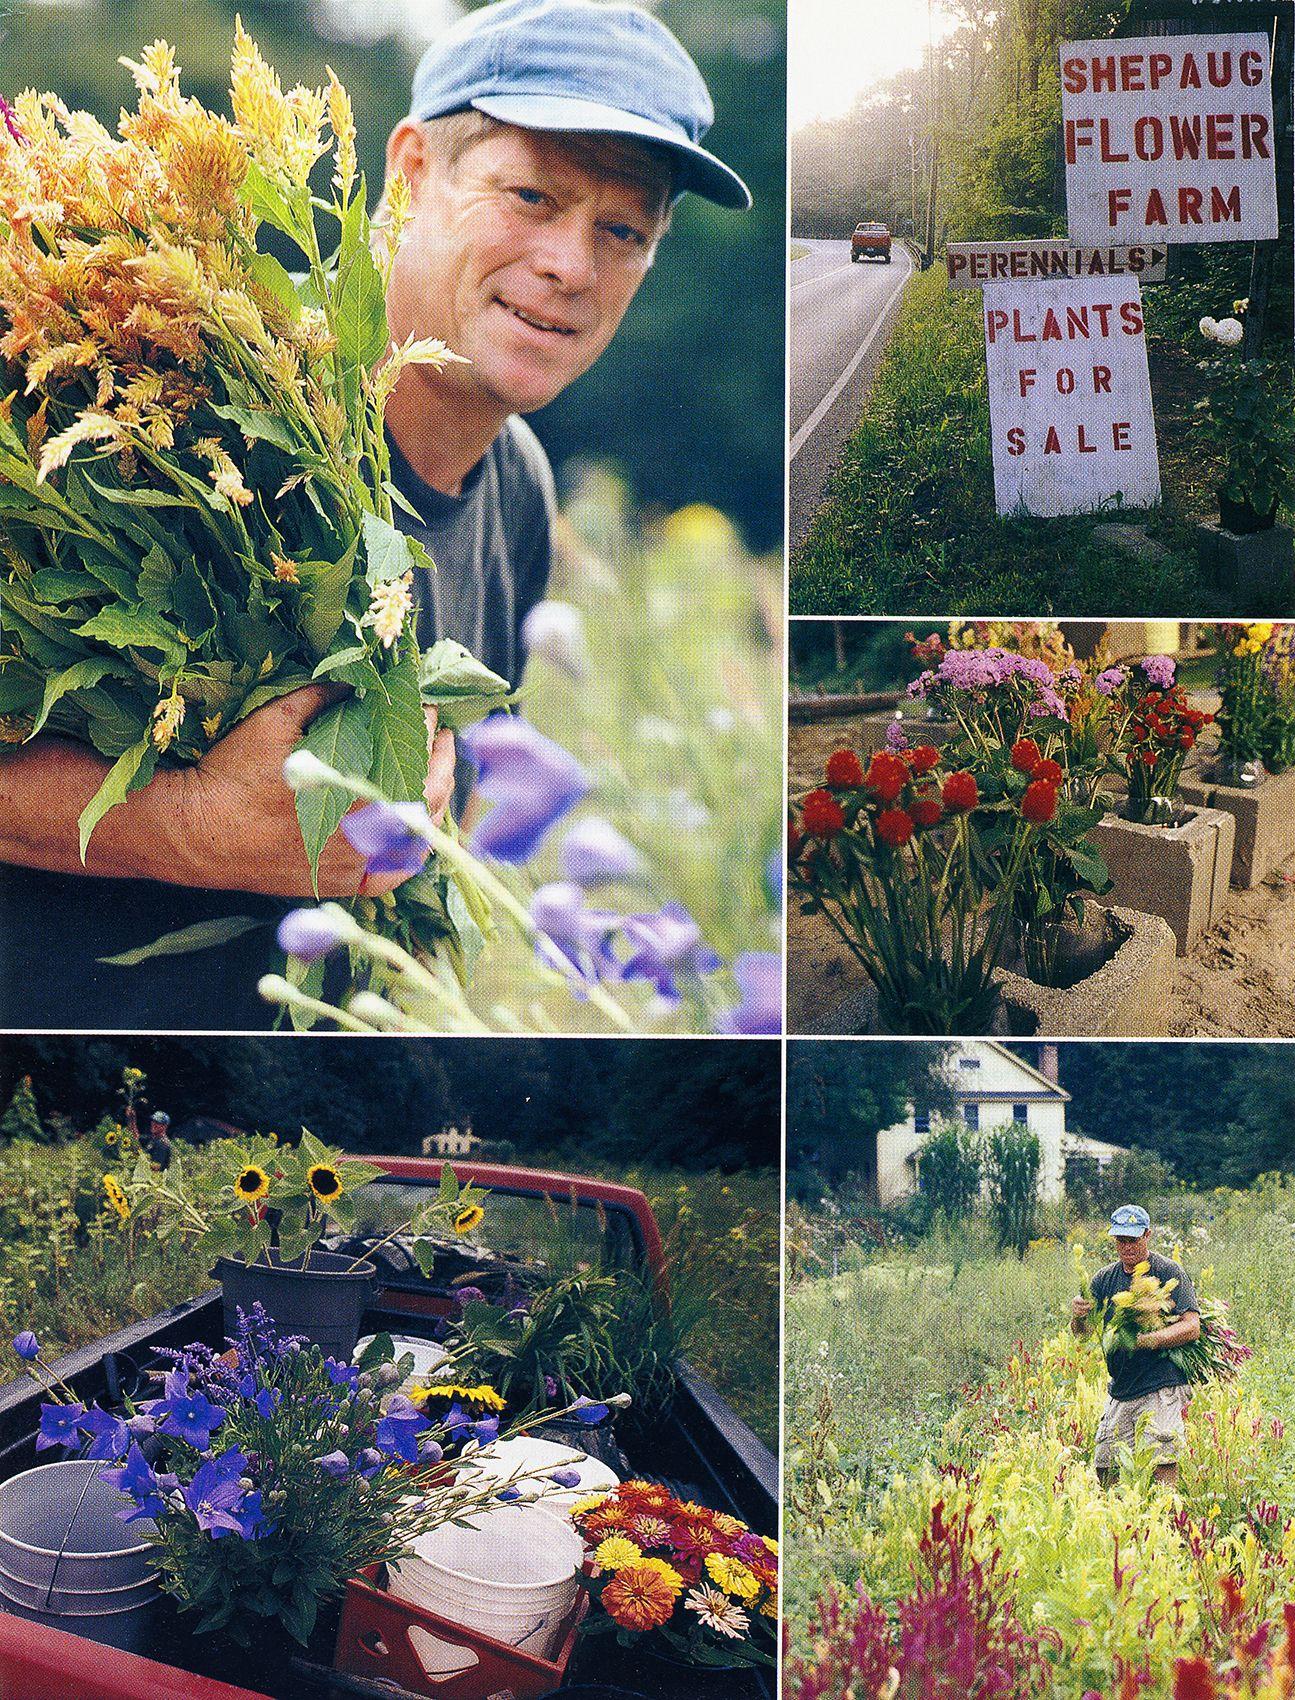 Horticulture-MayJune2002-2.jpg